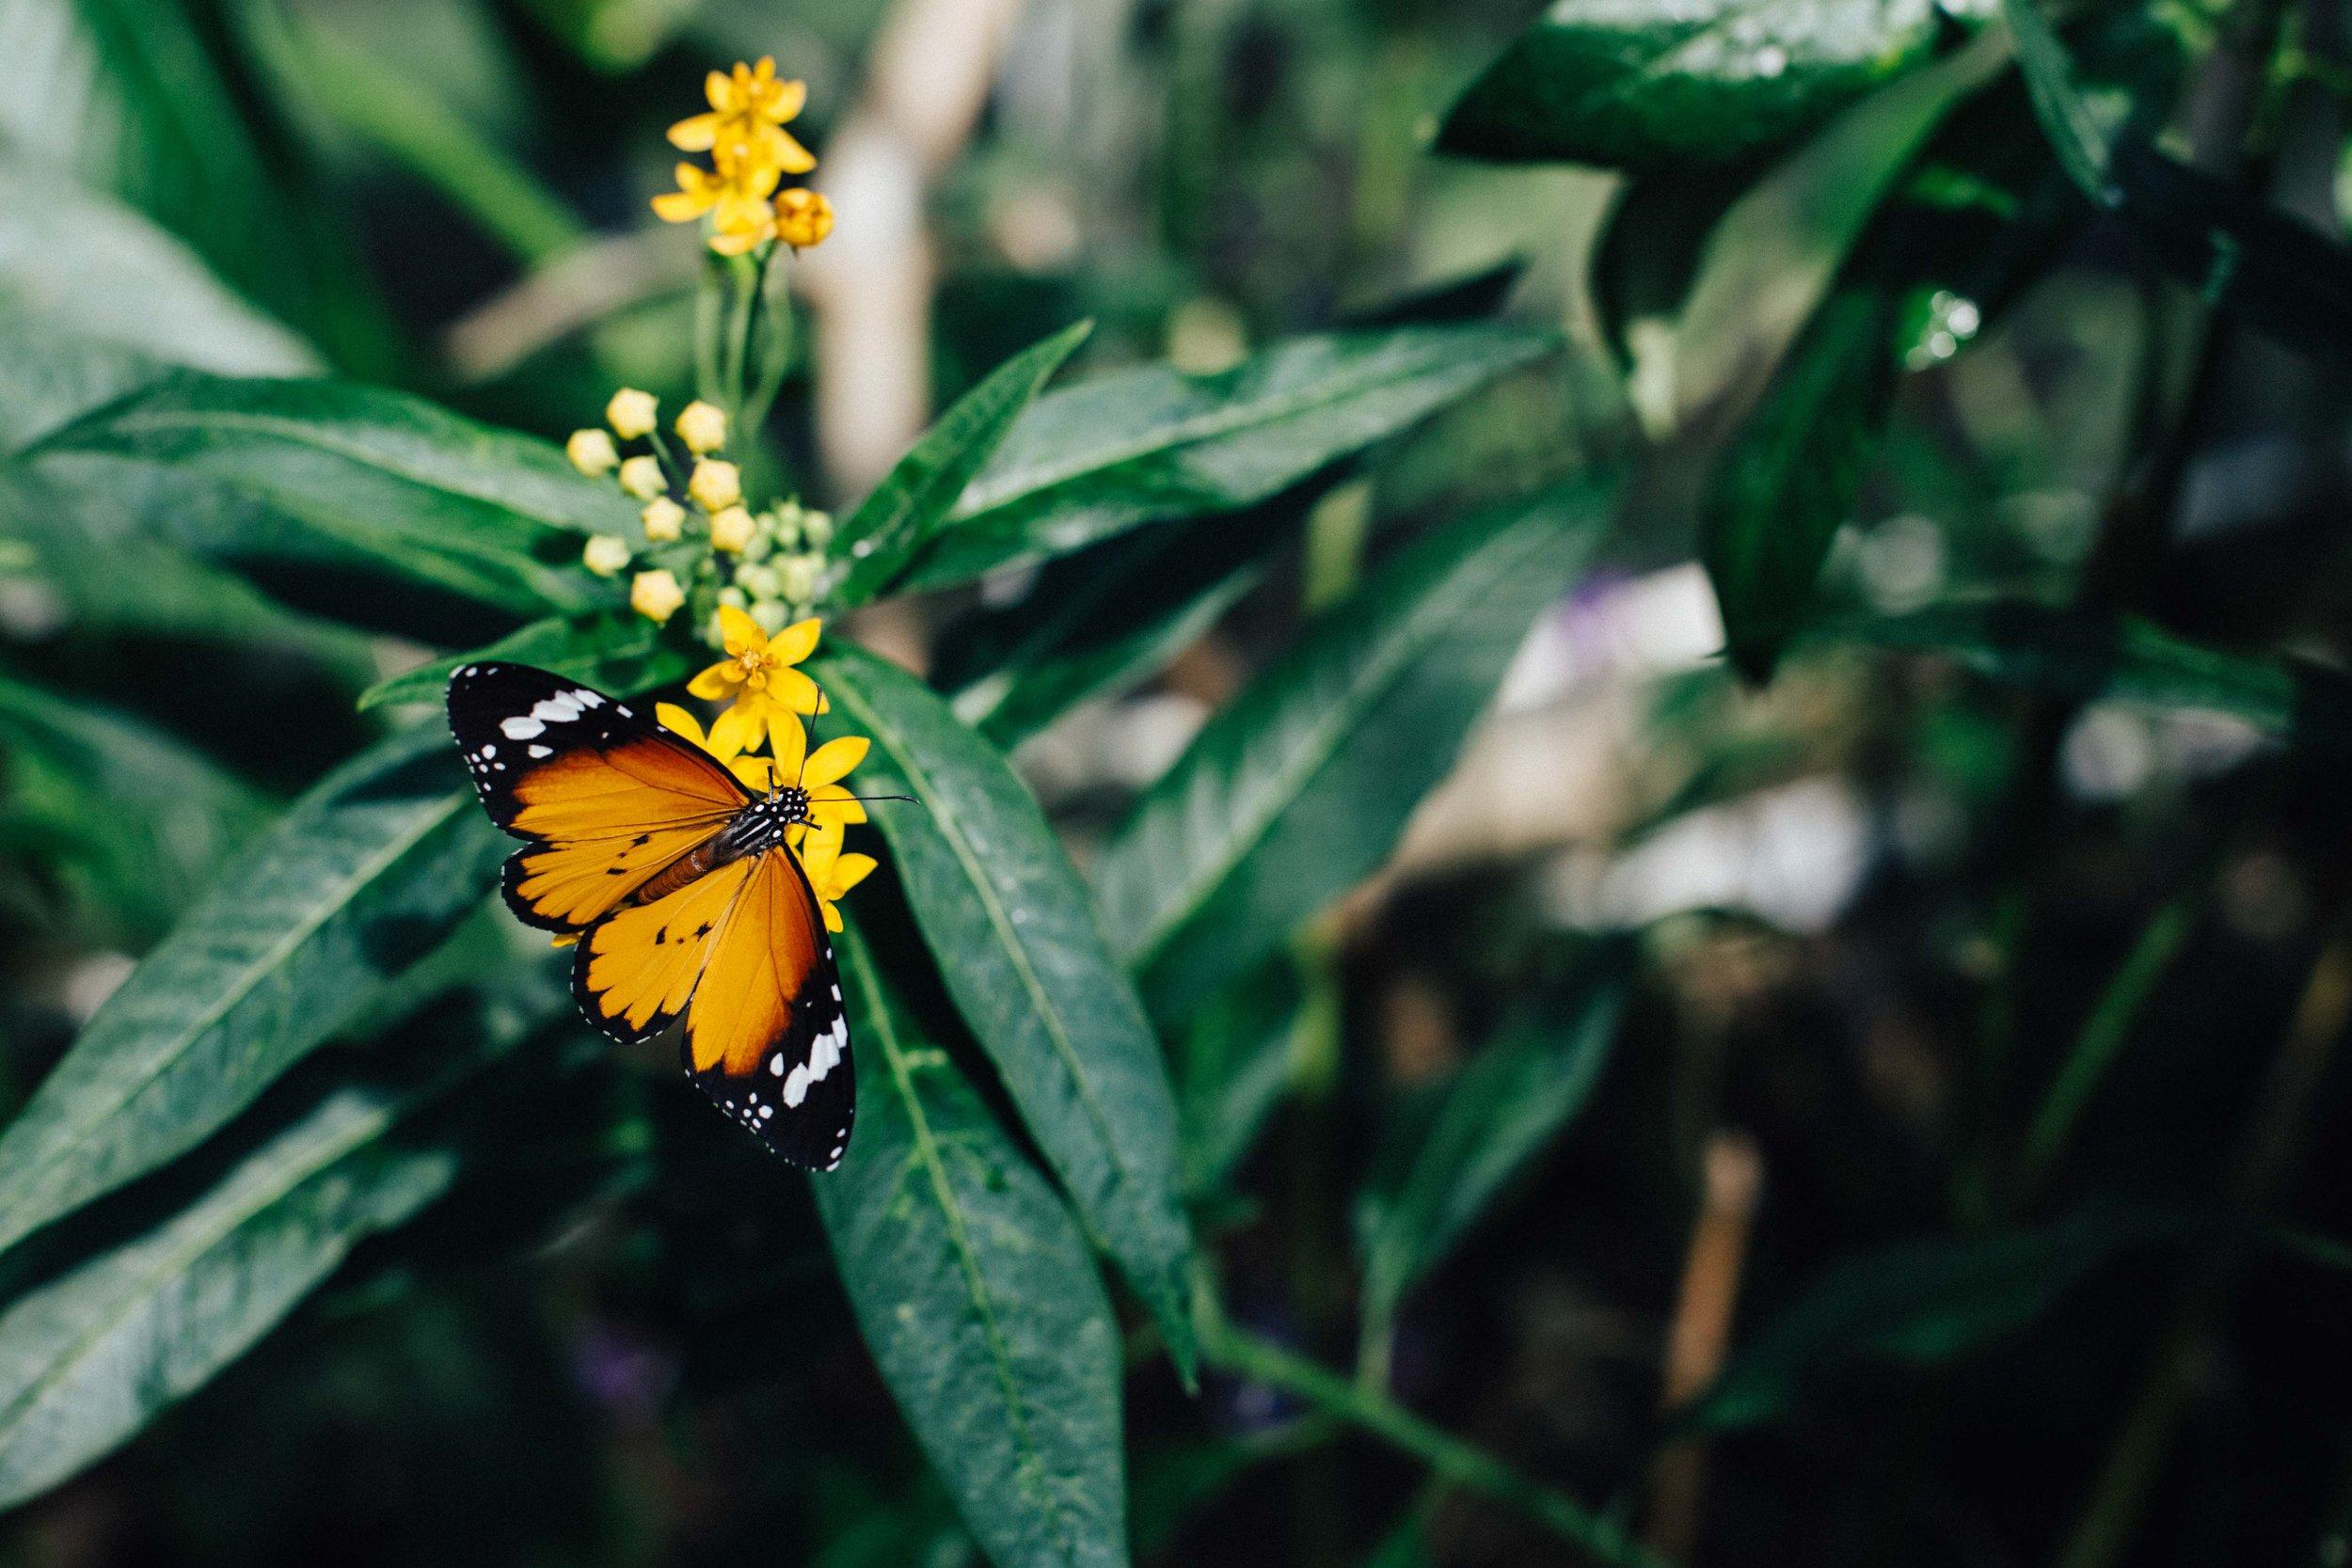 Butterfly in Butterfly House, Horniman Museum, Forrest Hill, London